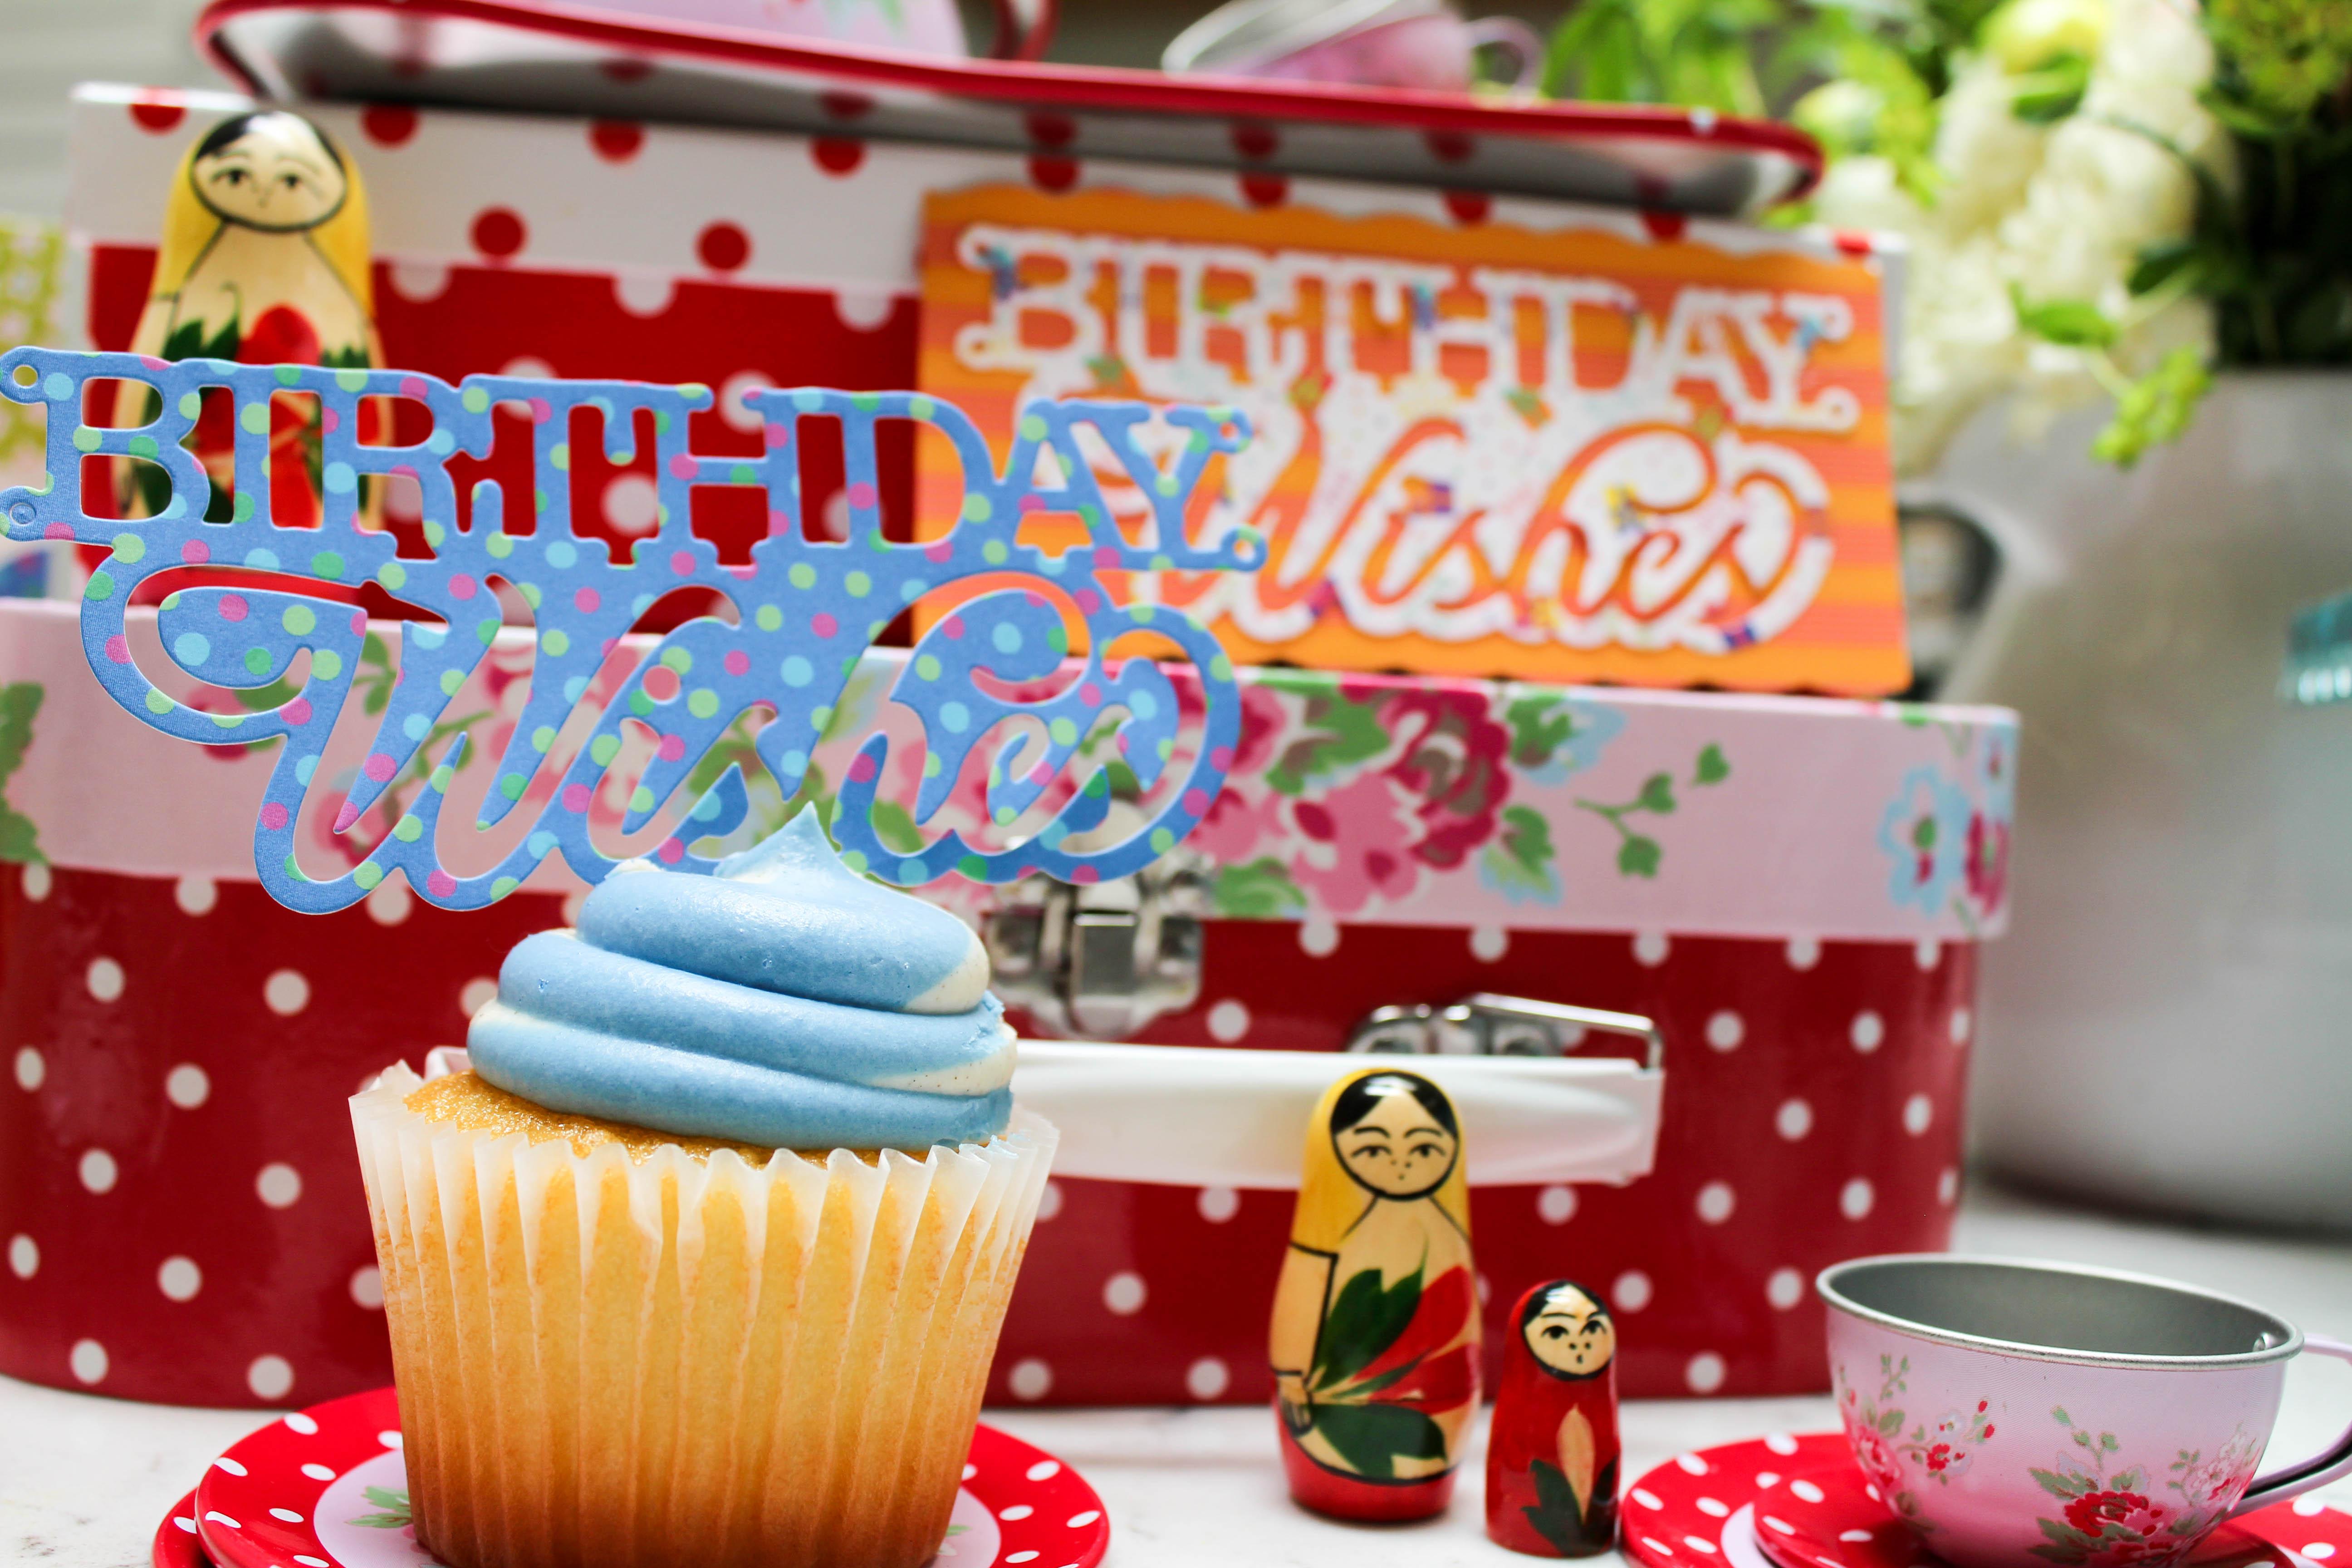 matroyshka nesting dolls where women cook sizzix dies birthday wishes cake topper-4